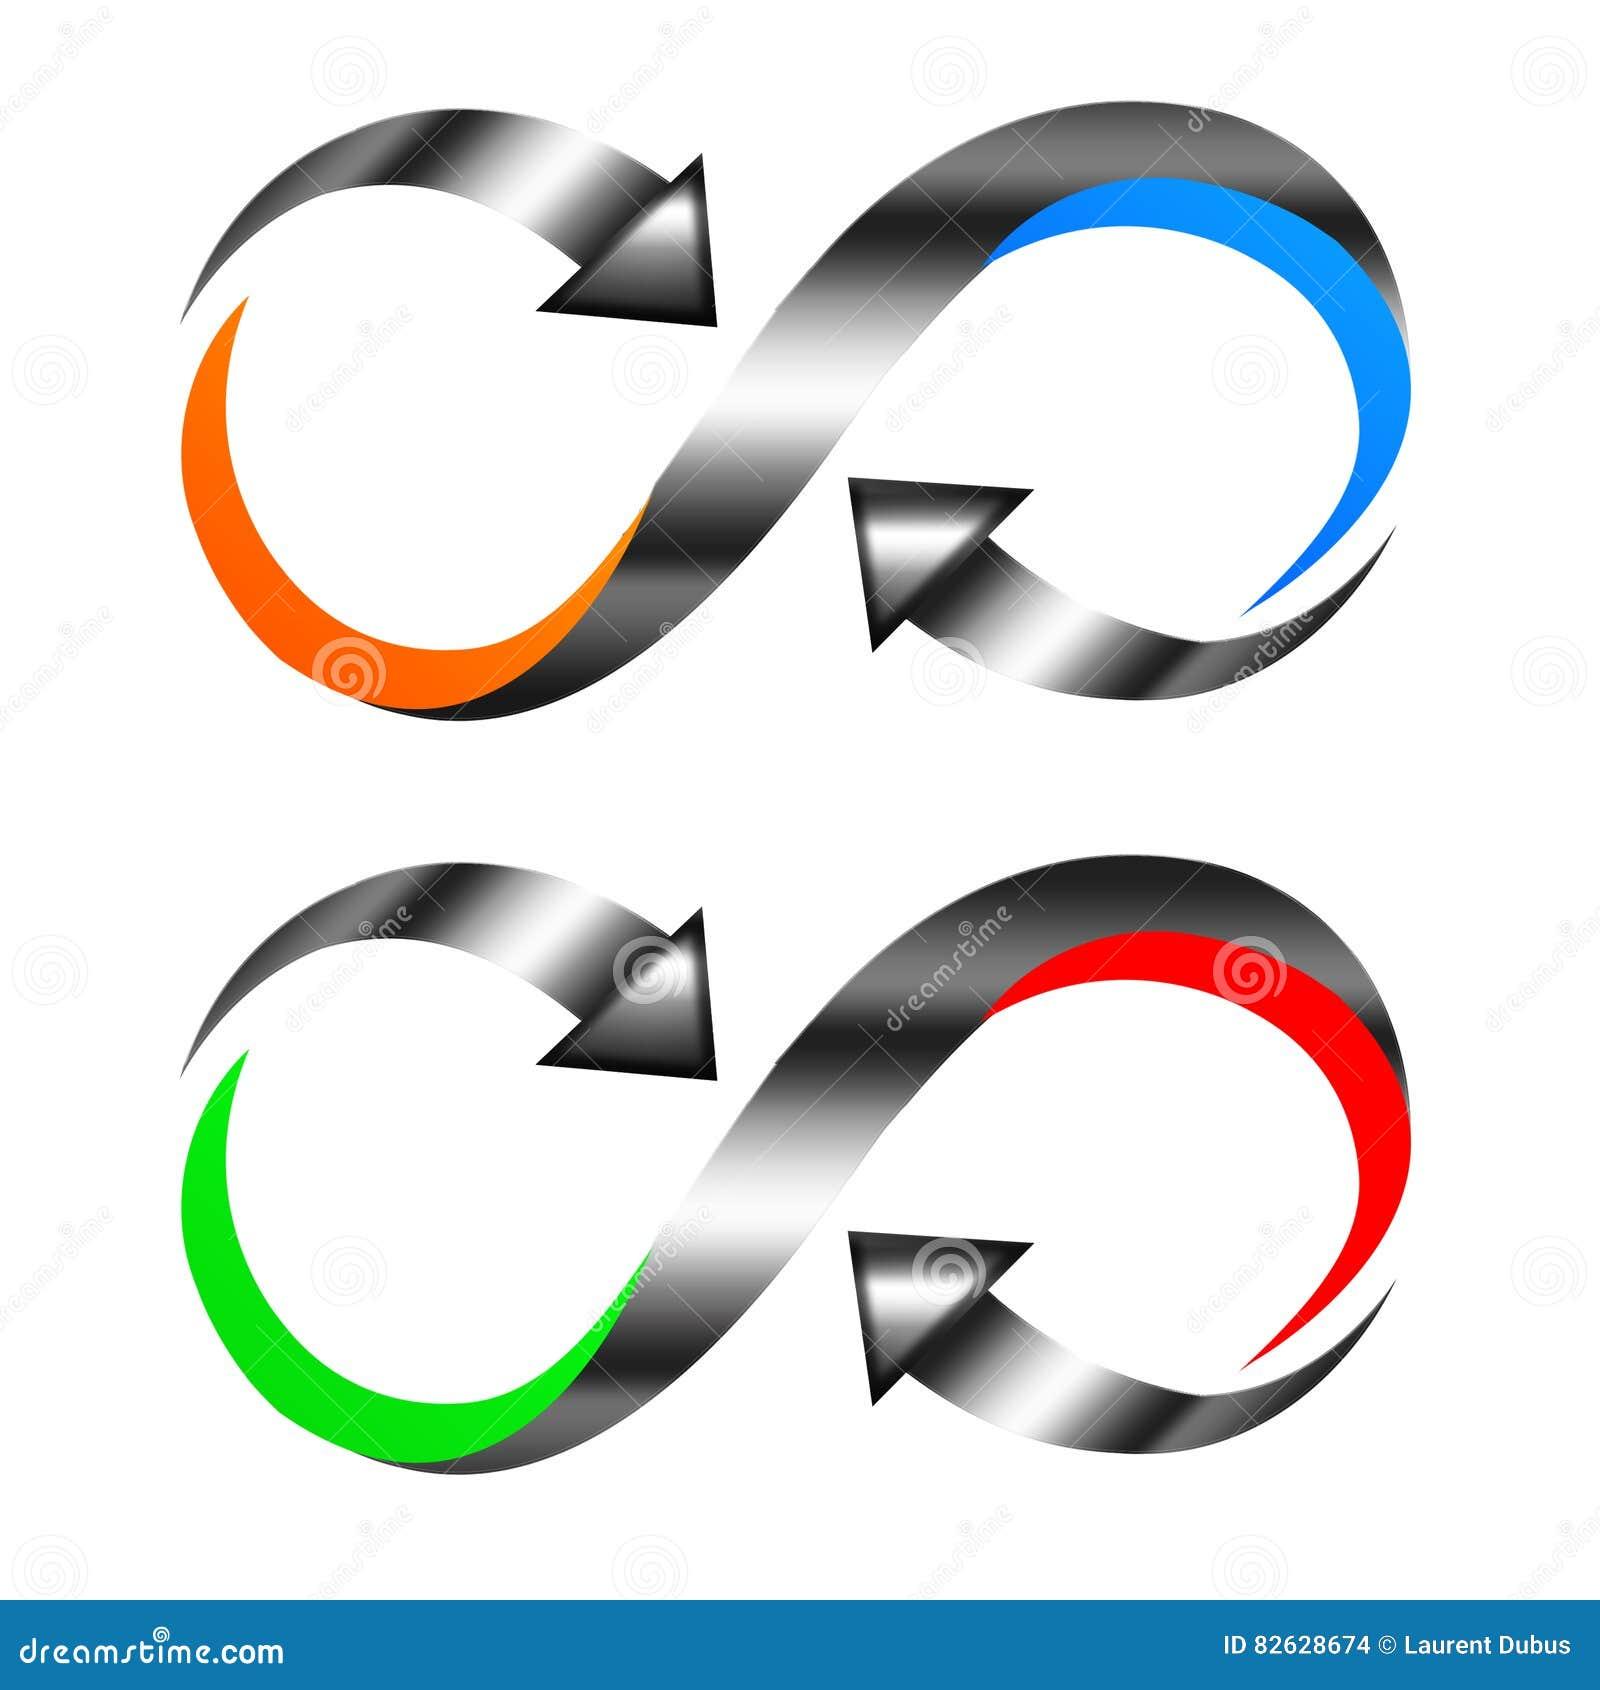 Infinity Symbol Stock Photo Illustration Of Infinity 82628674